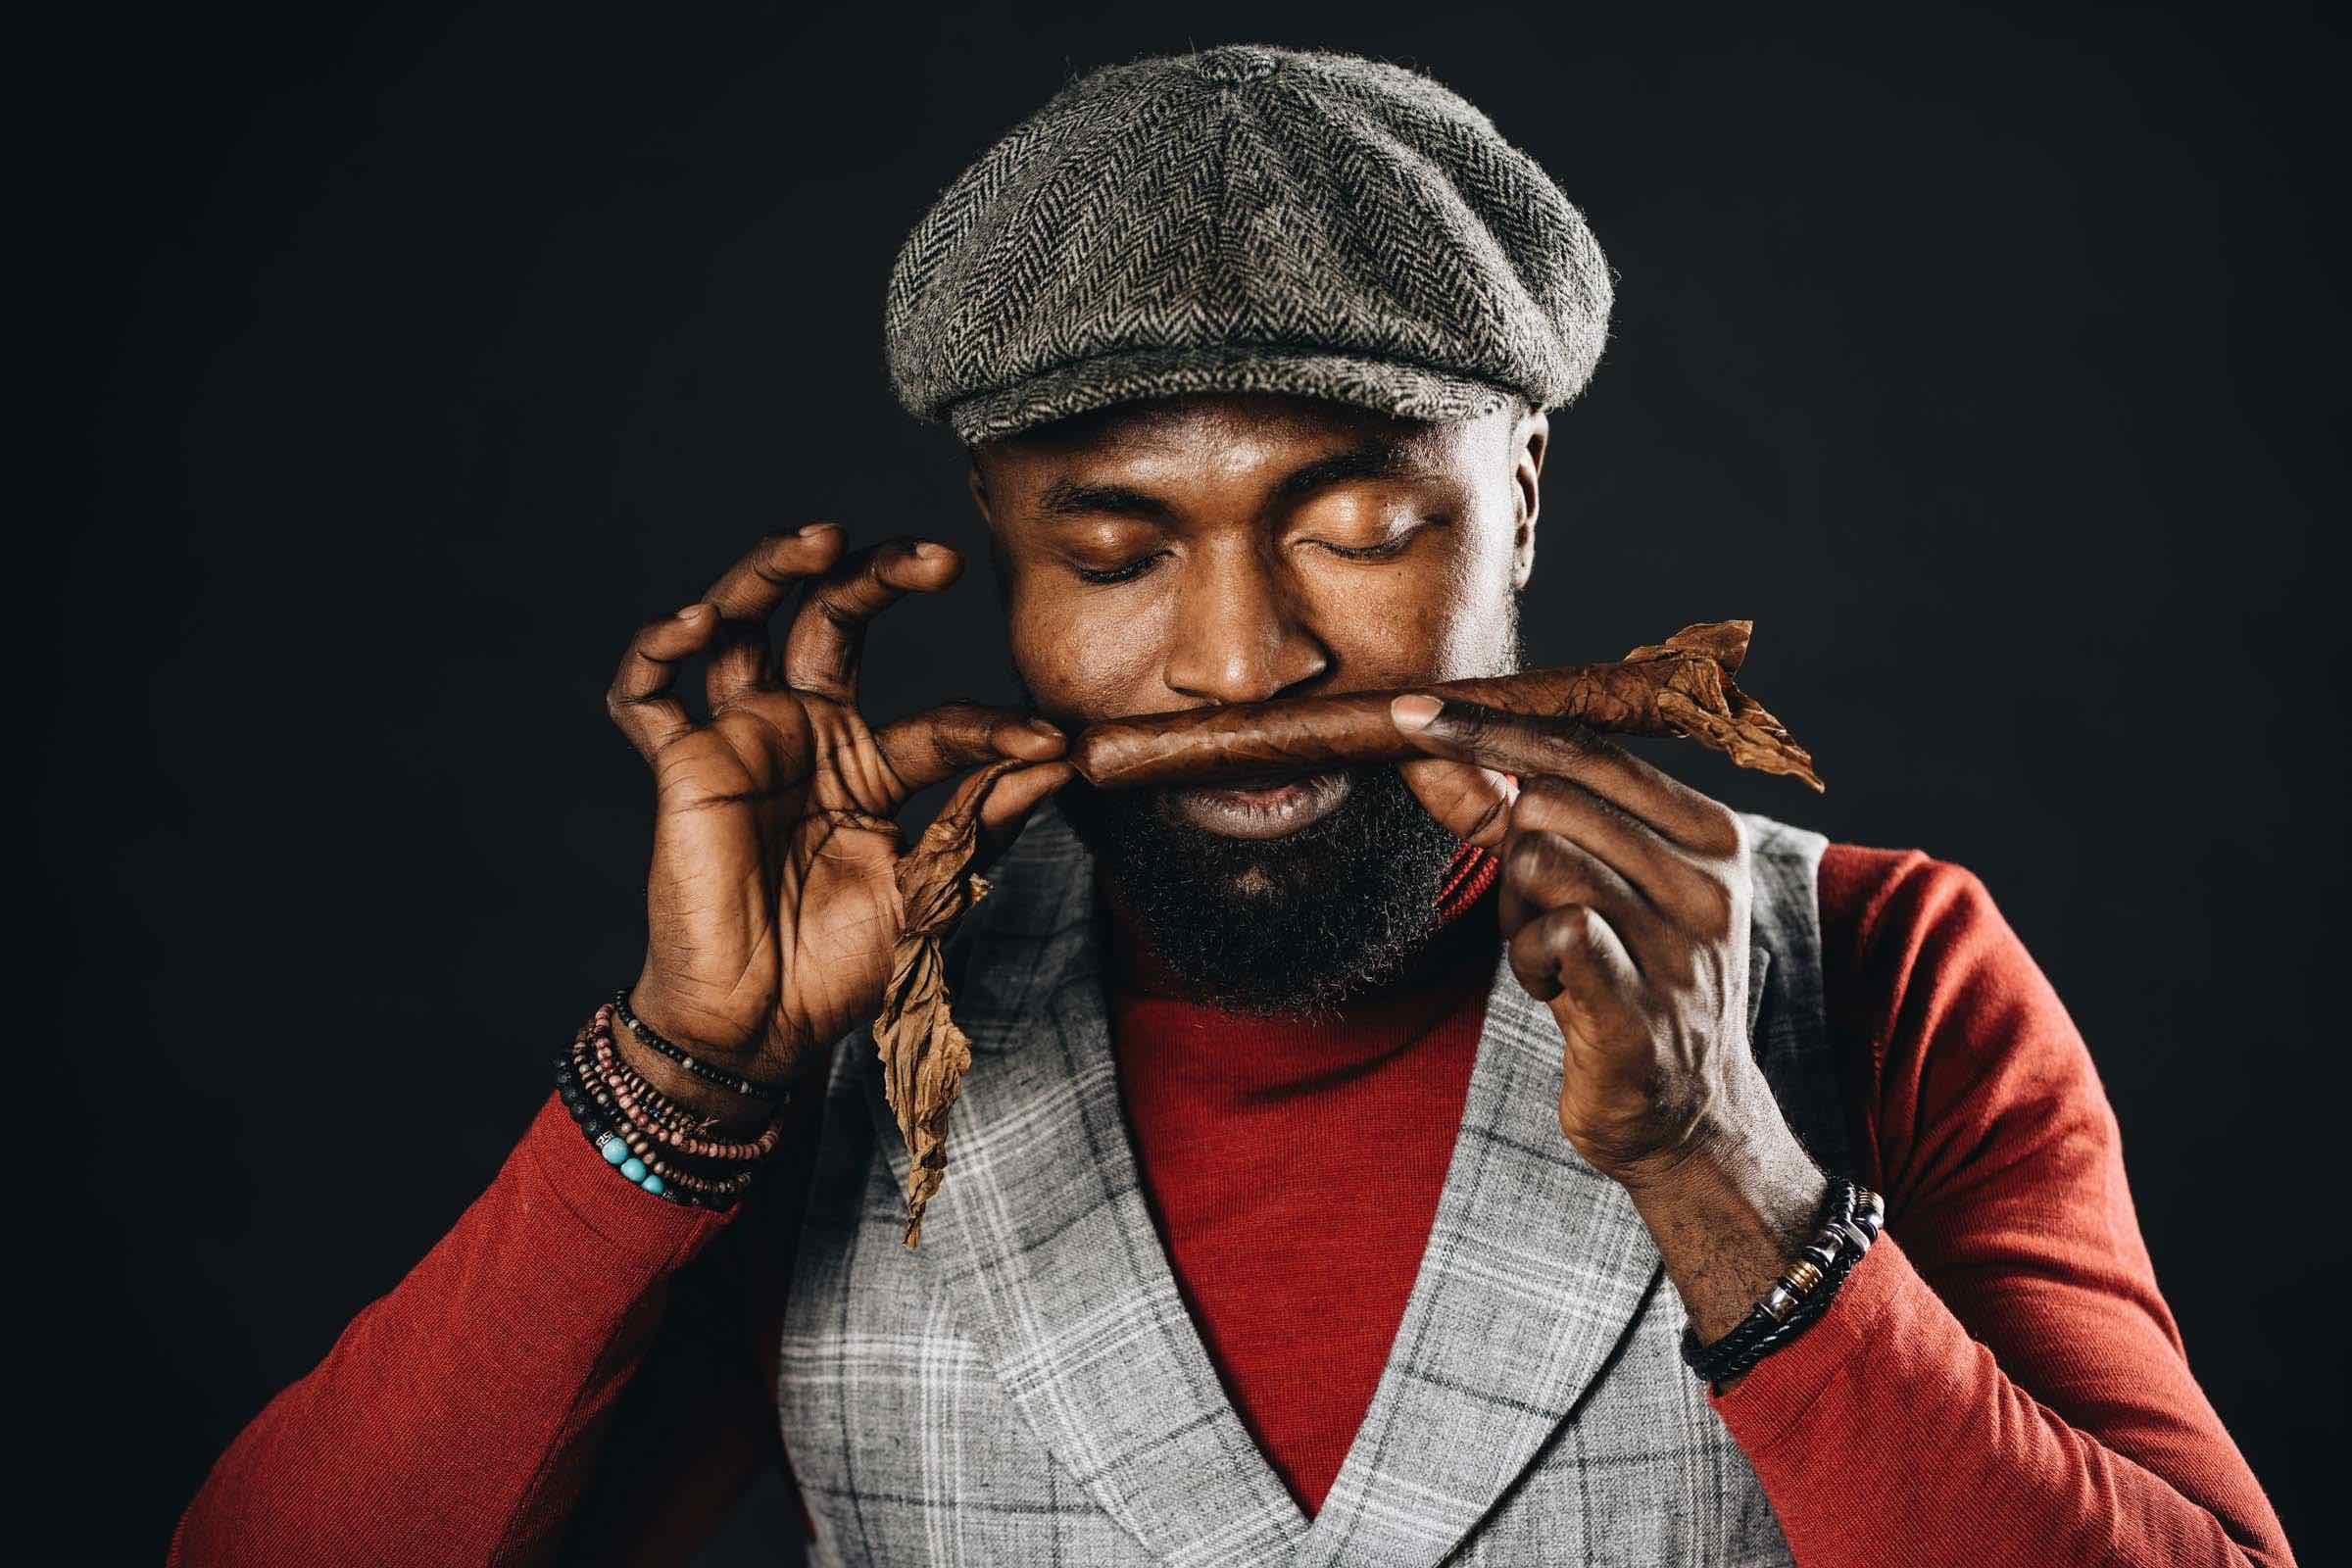 Zigarrendreher | Hamburg | Zigarrenroller | Zigarrenrollerin | Mieten | Anfragen | Trocadero | Handgemacht | Zigarren | Robusto | Corona | Torpedo | Churchill | Banderole | Bauchbinde | drehen | Tabak | Sumatra | Brasilien | Cuba